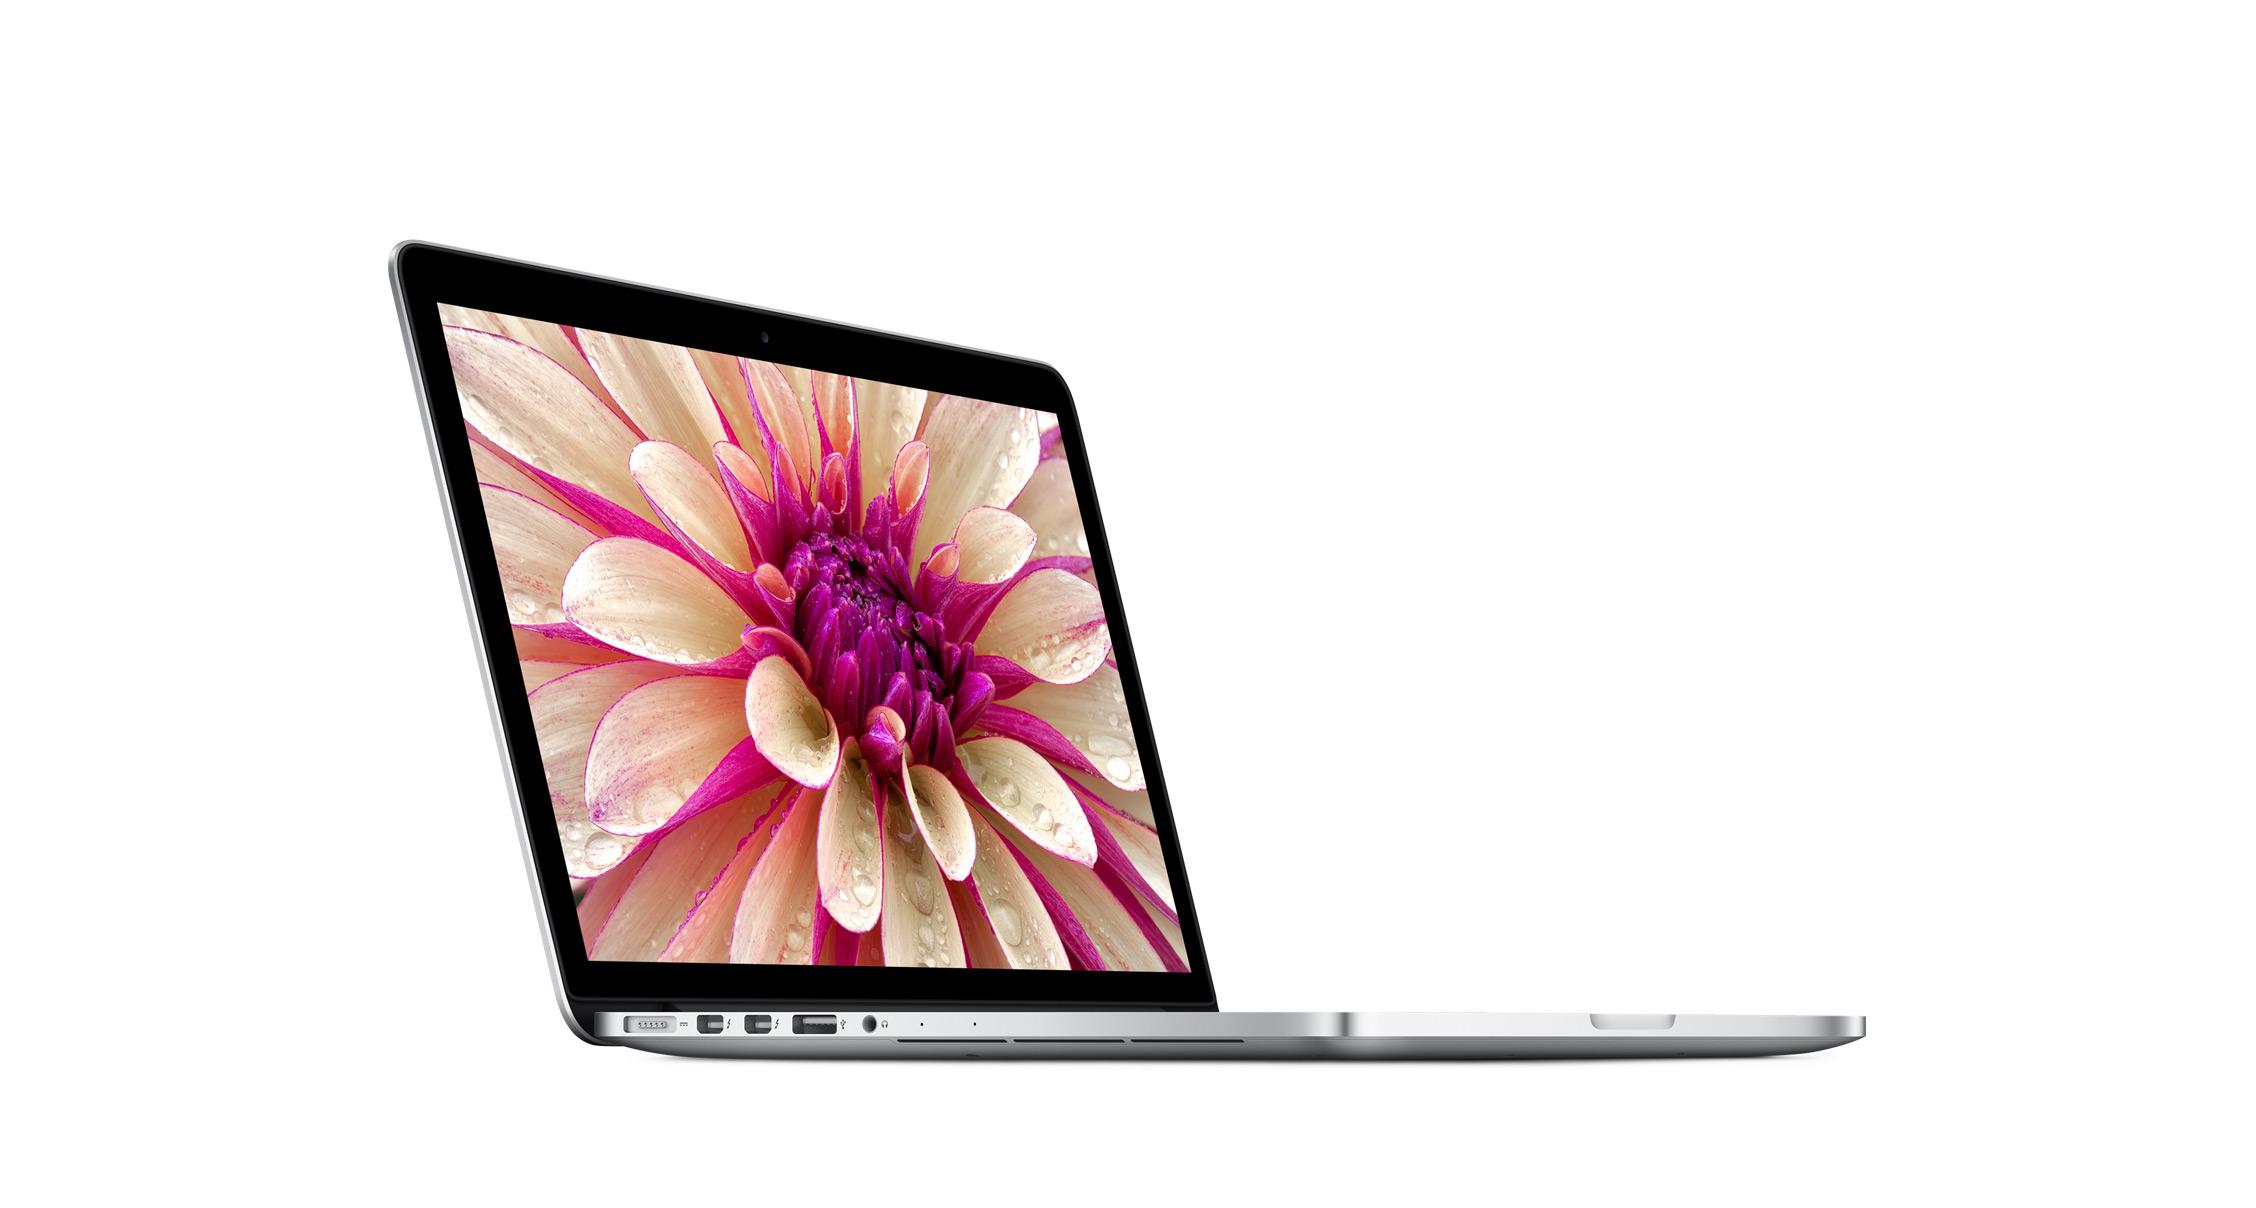 Macbook Pro Retina 15 inch 2015- MJLT2 - I7/ 2.5/ 16/ 512GB Card rời  2GB / 99%